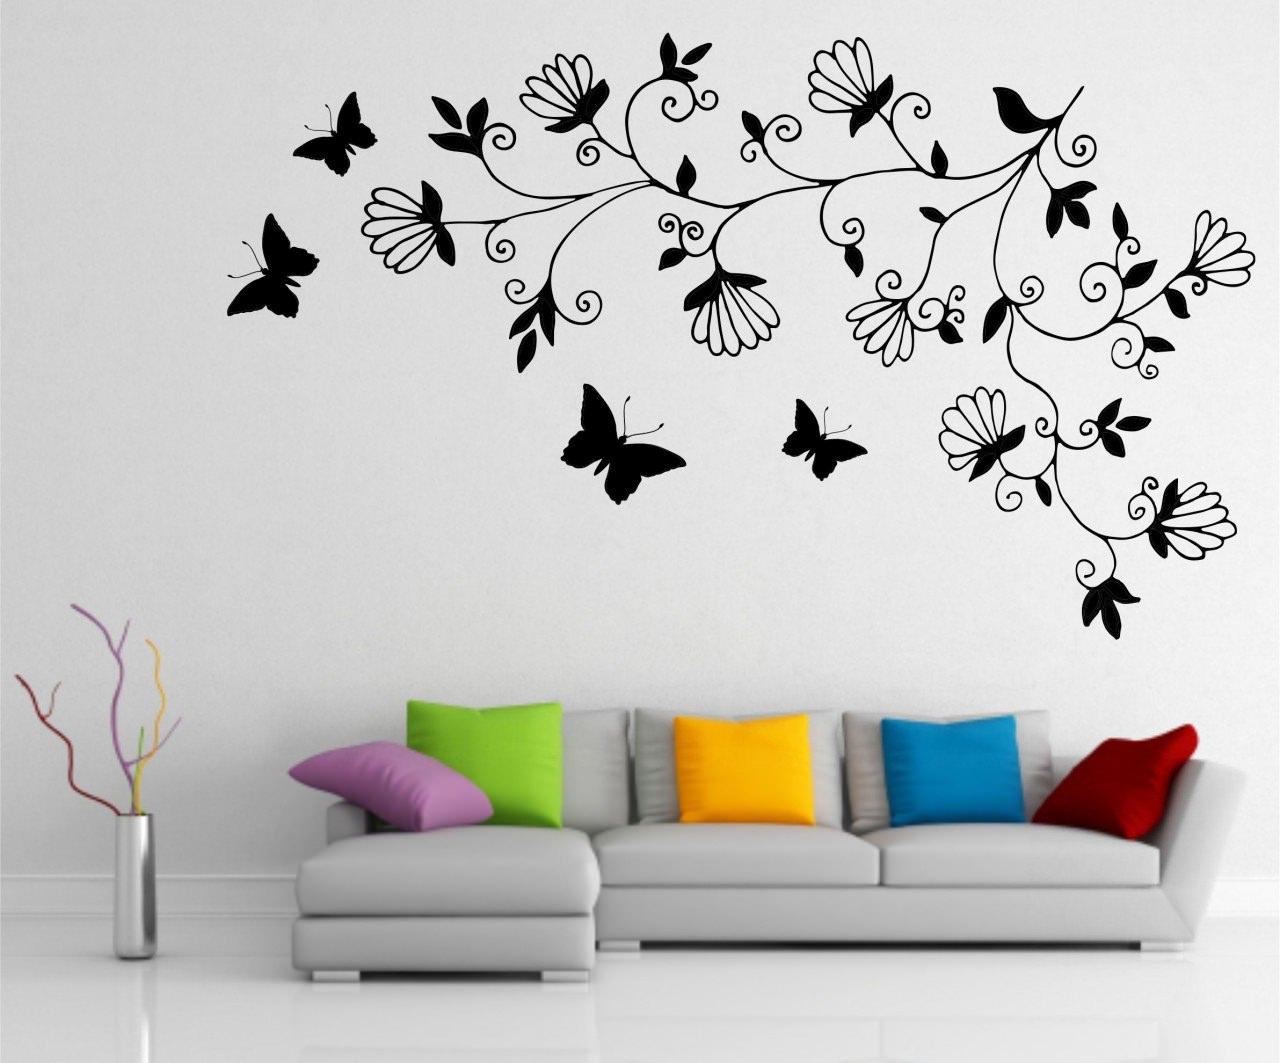 15 Wall Paintings  PSD Vector EPS JPG Download  FreeCreatives